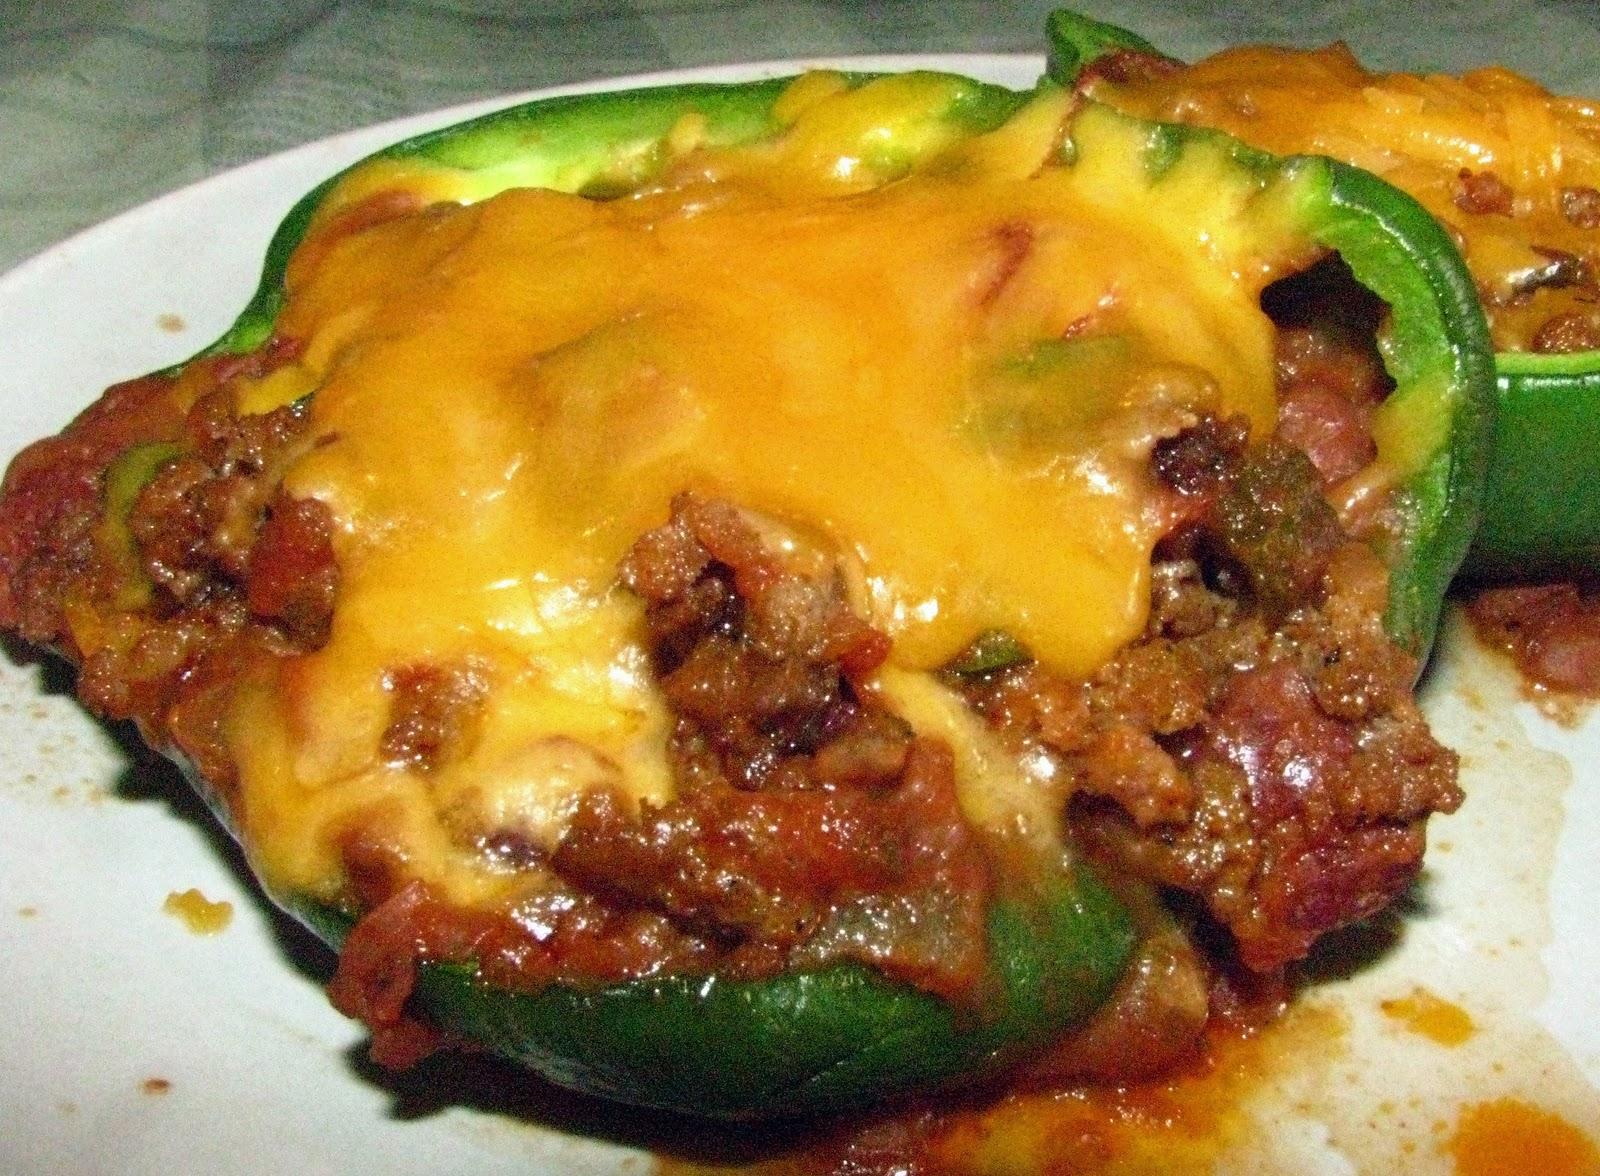 Angelgirlpj: Burrito Stuffed Green Peppers and Salsa